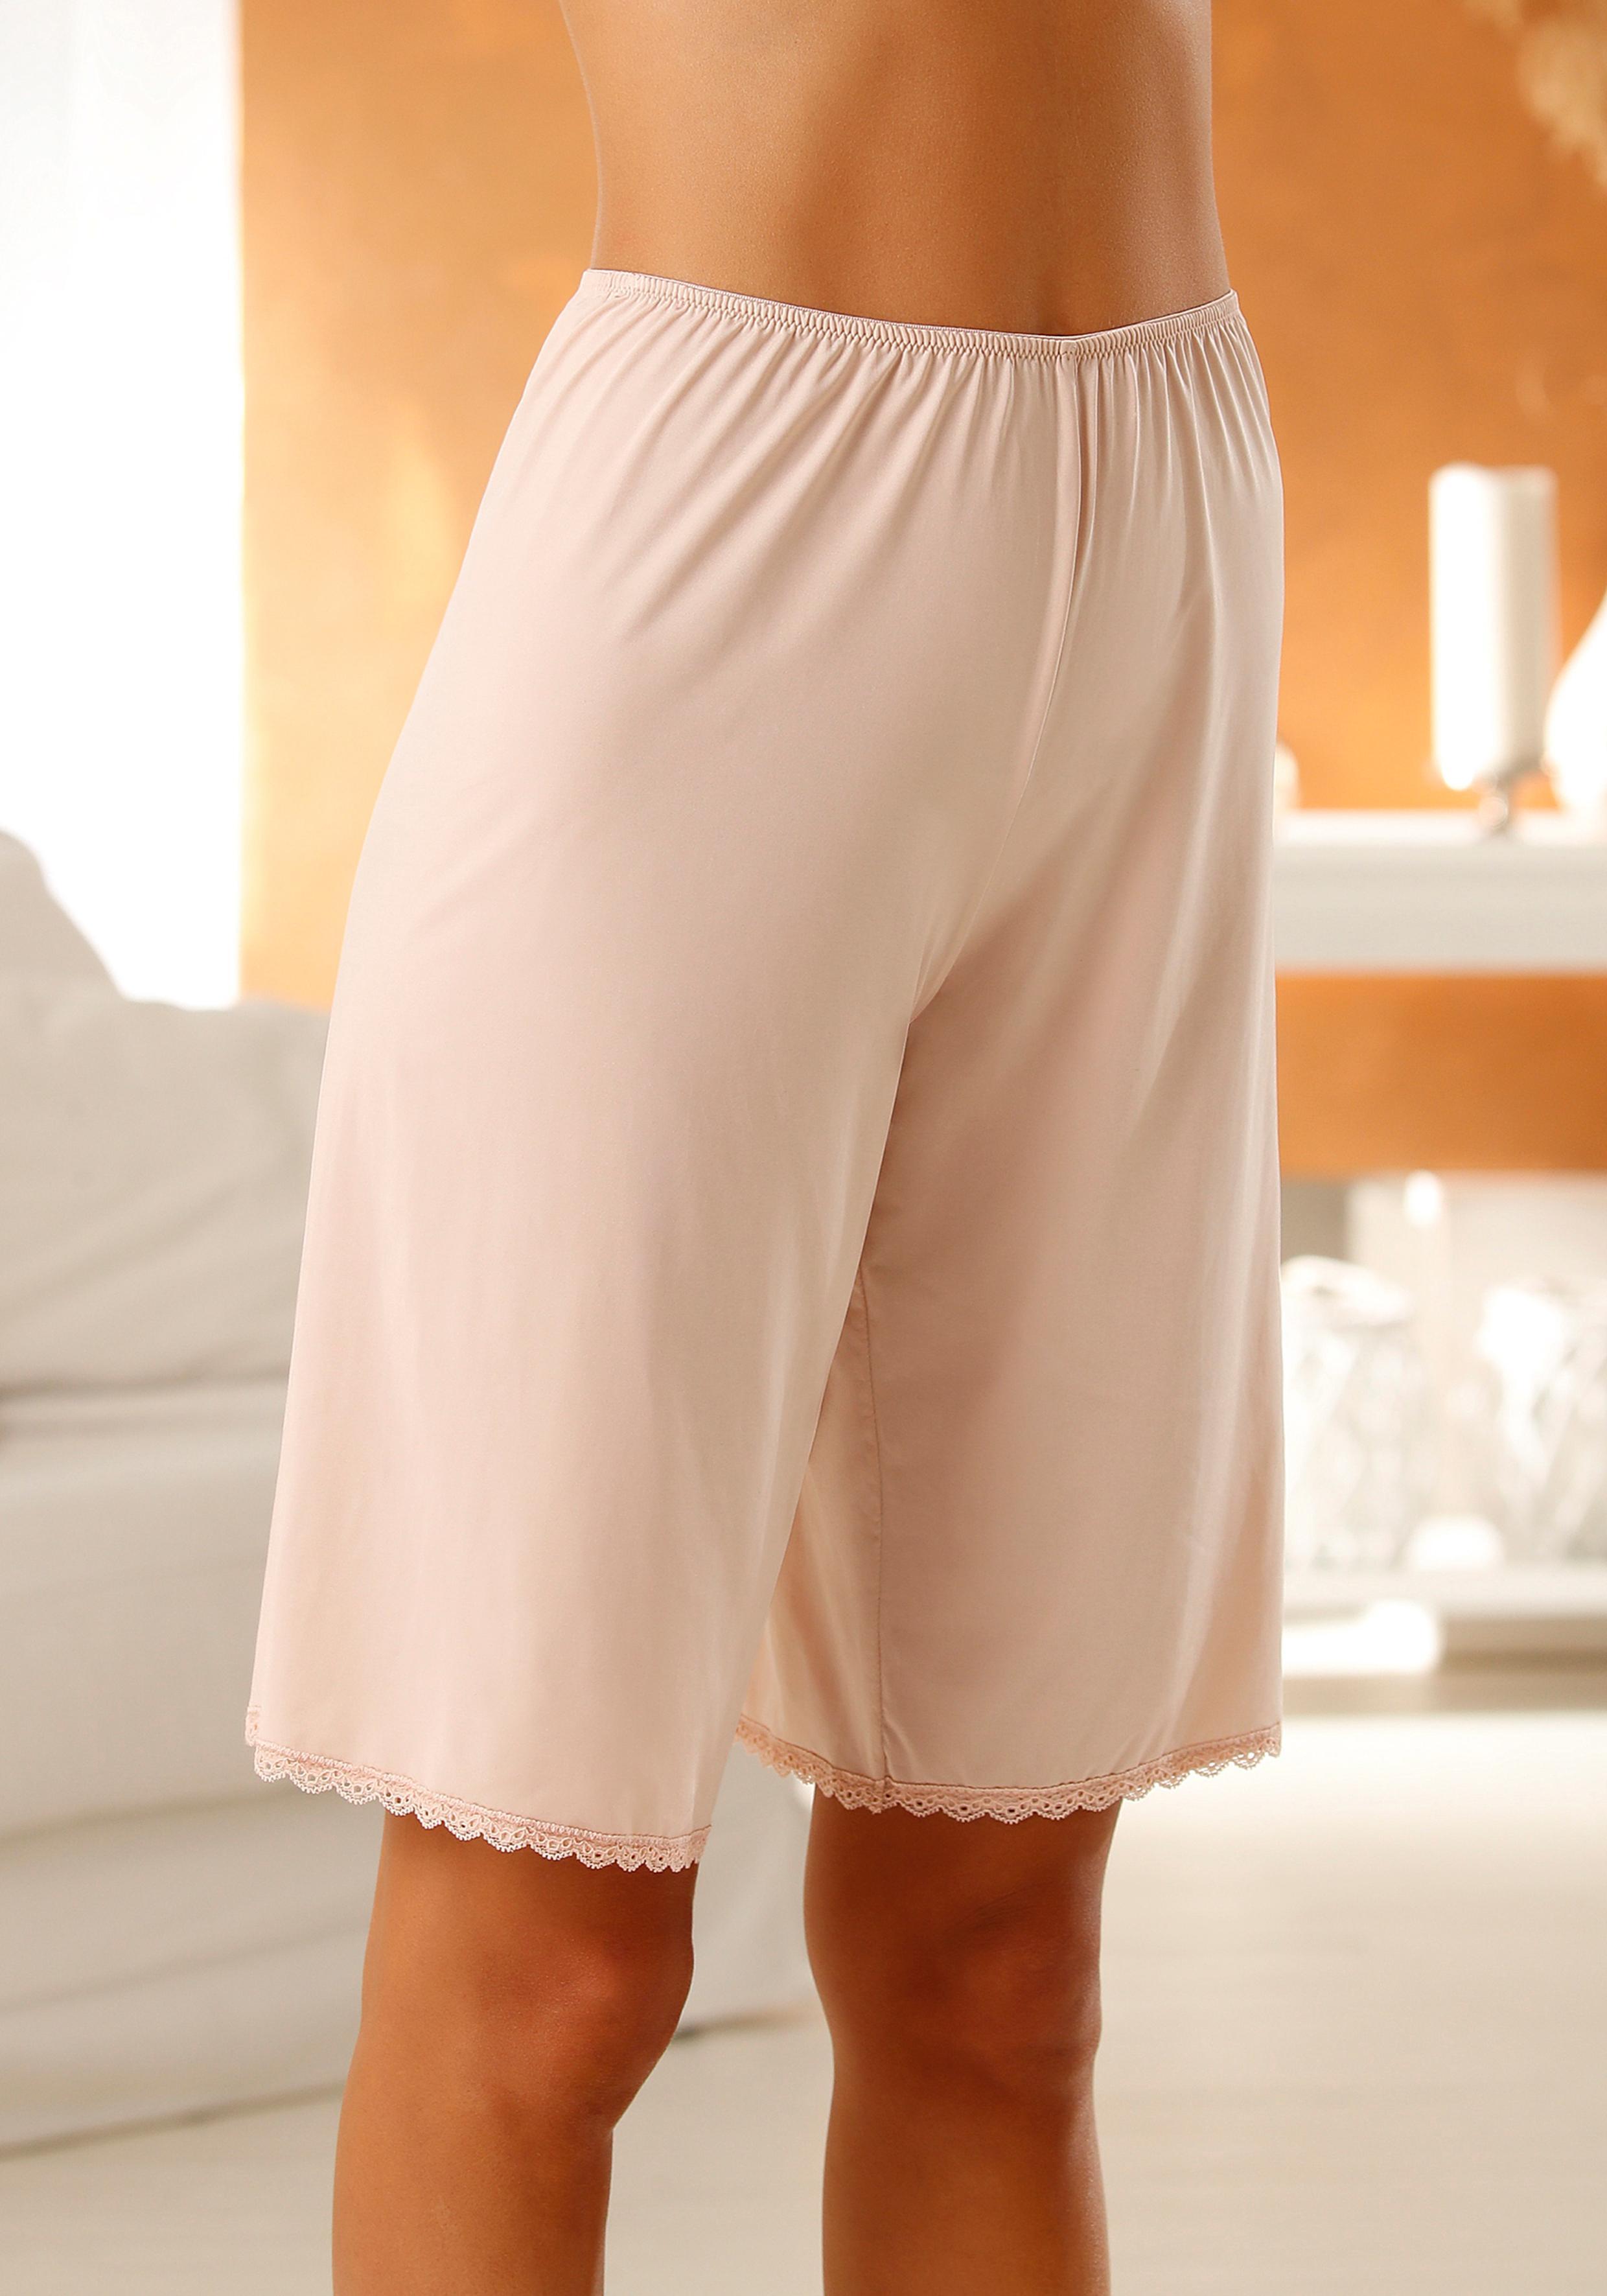 Nuance Hosenunterrock aus weich, fließendem Material